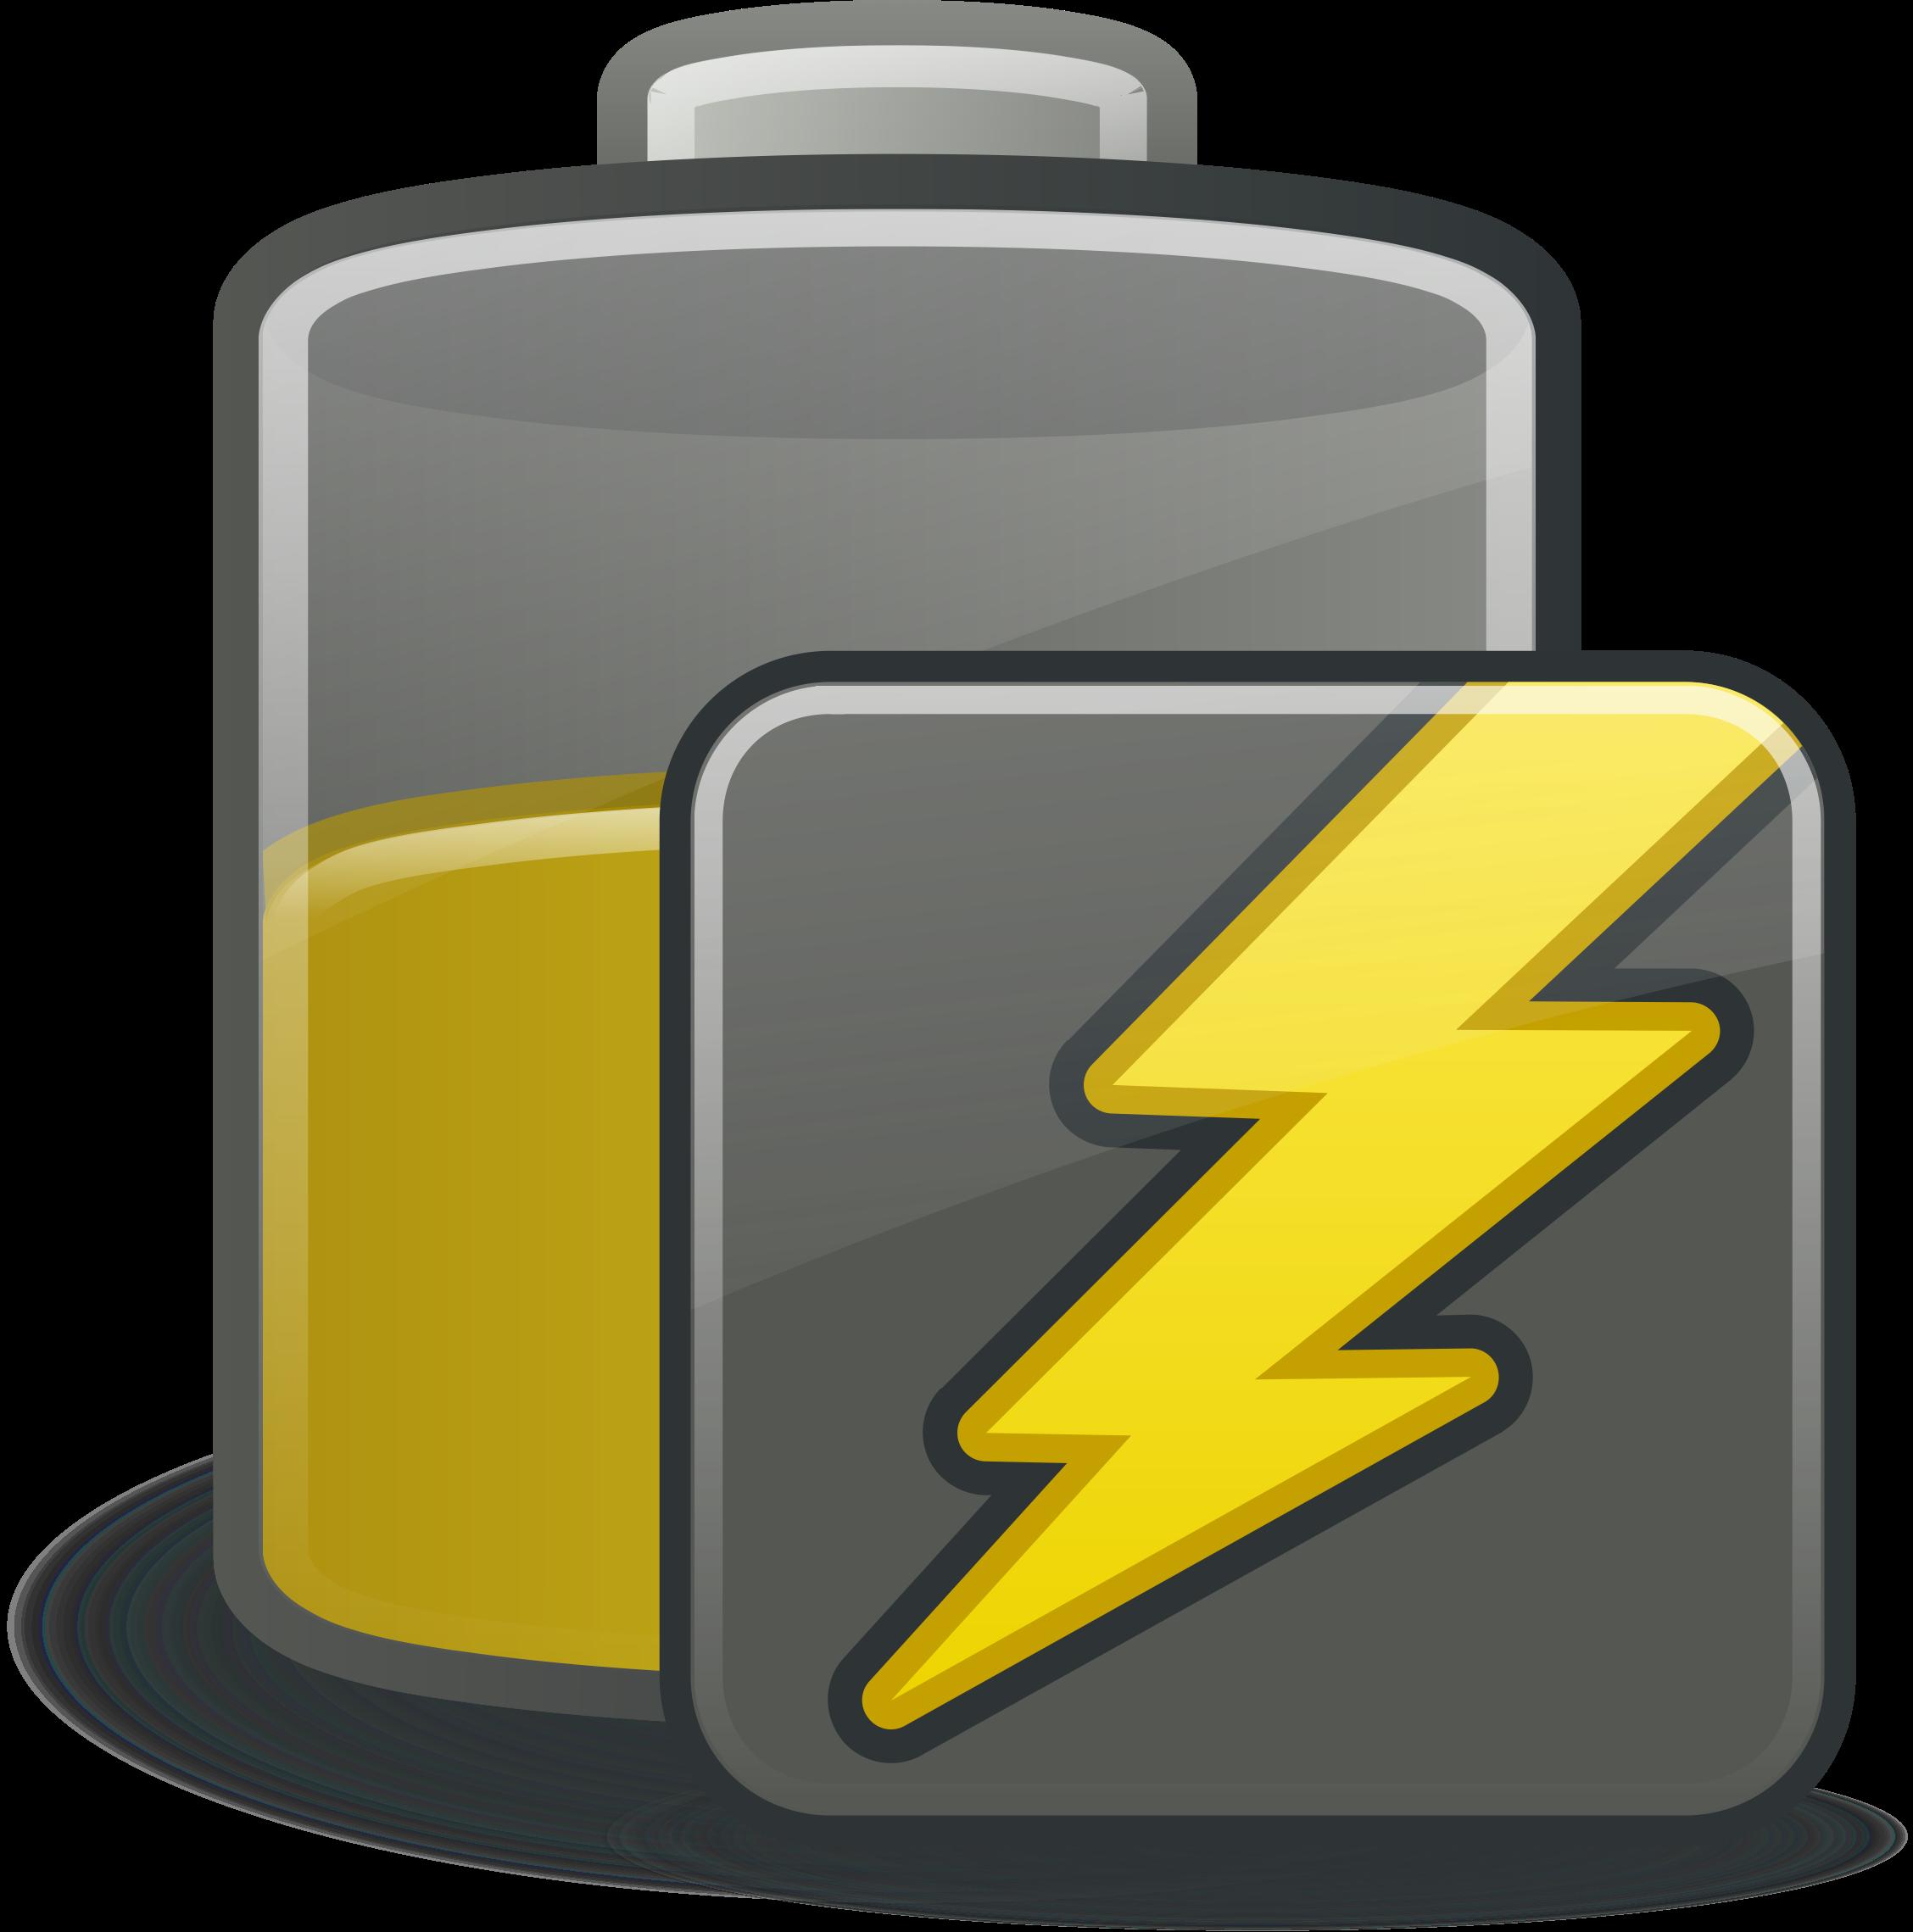 Battery clipart medium. Charging